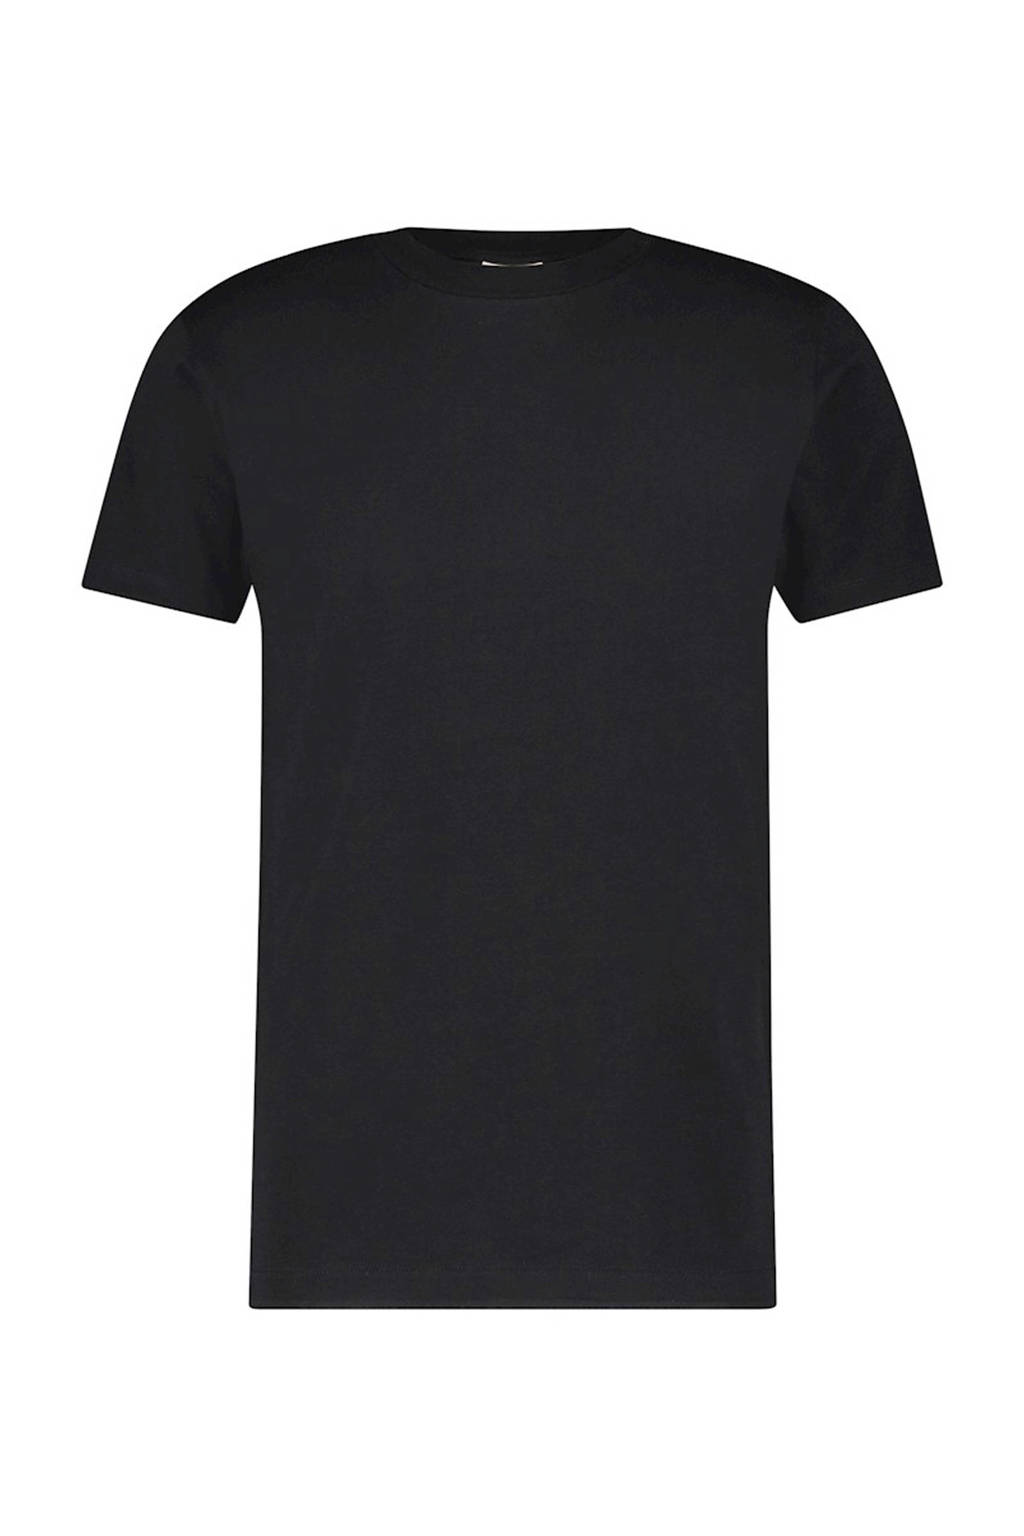 Purewhite T-shirt zwart, Zwart